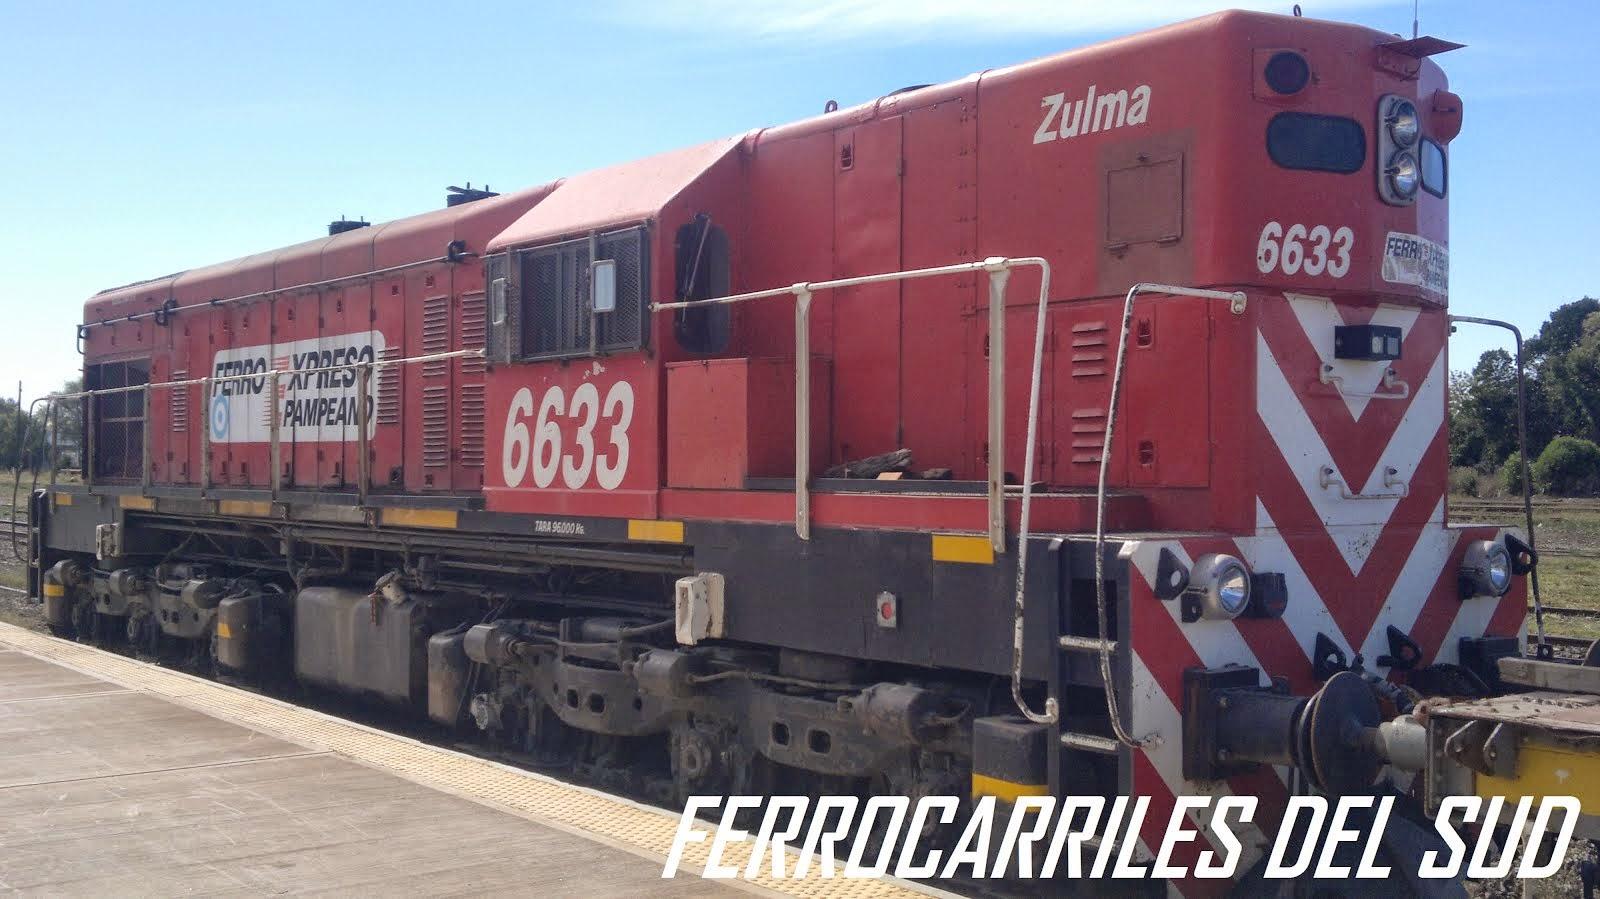 GM GR-12 6633